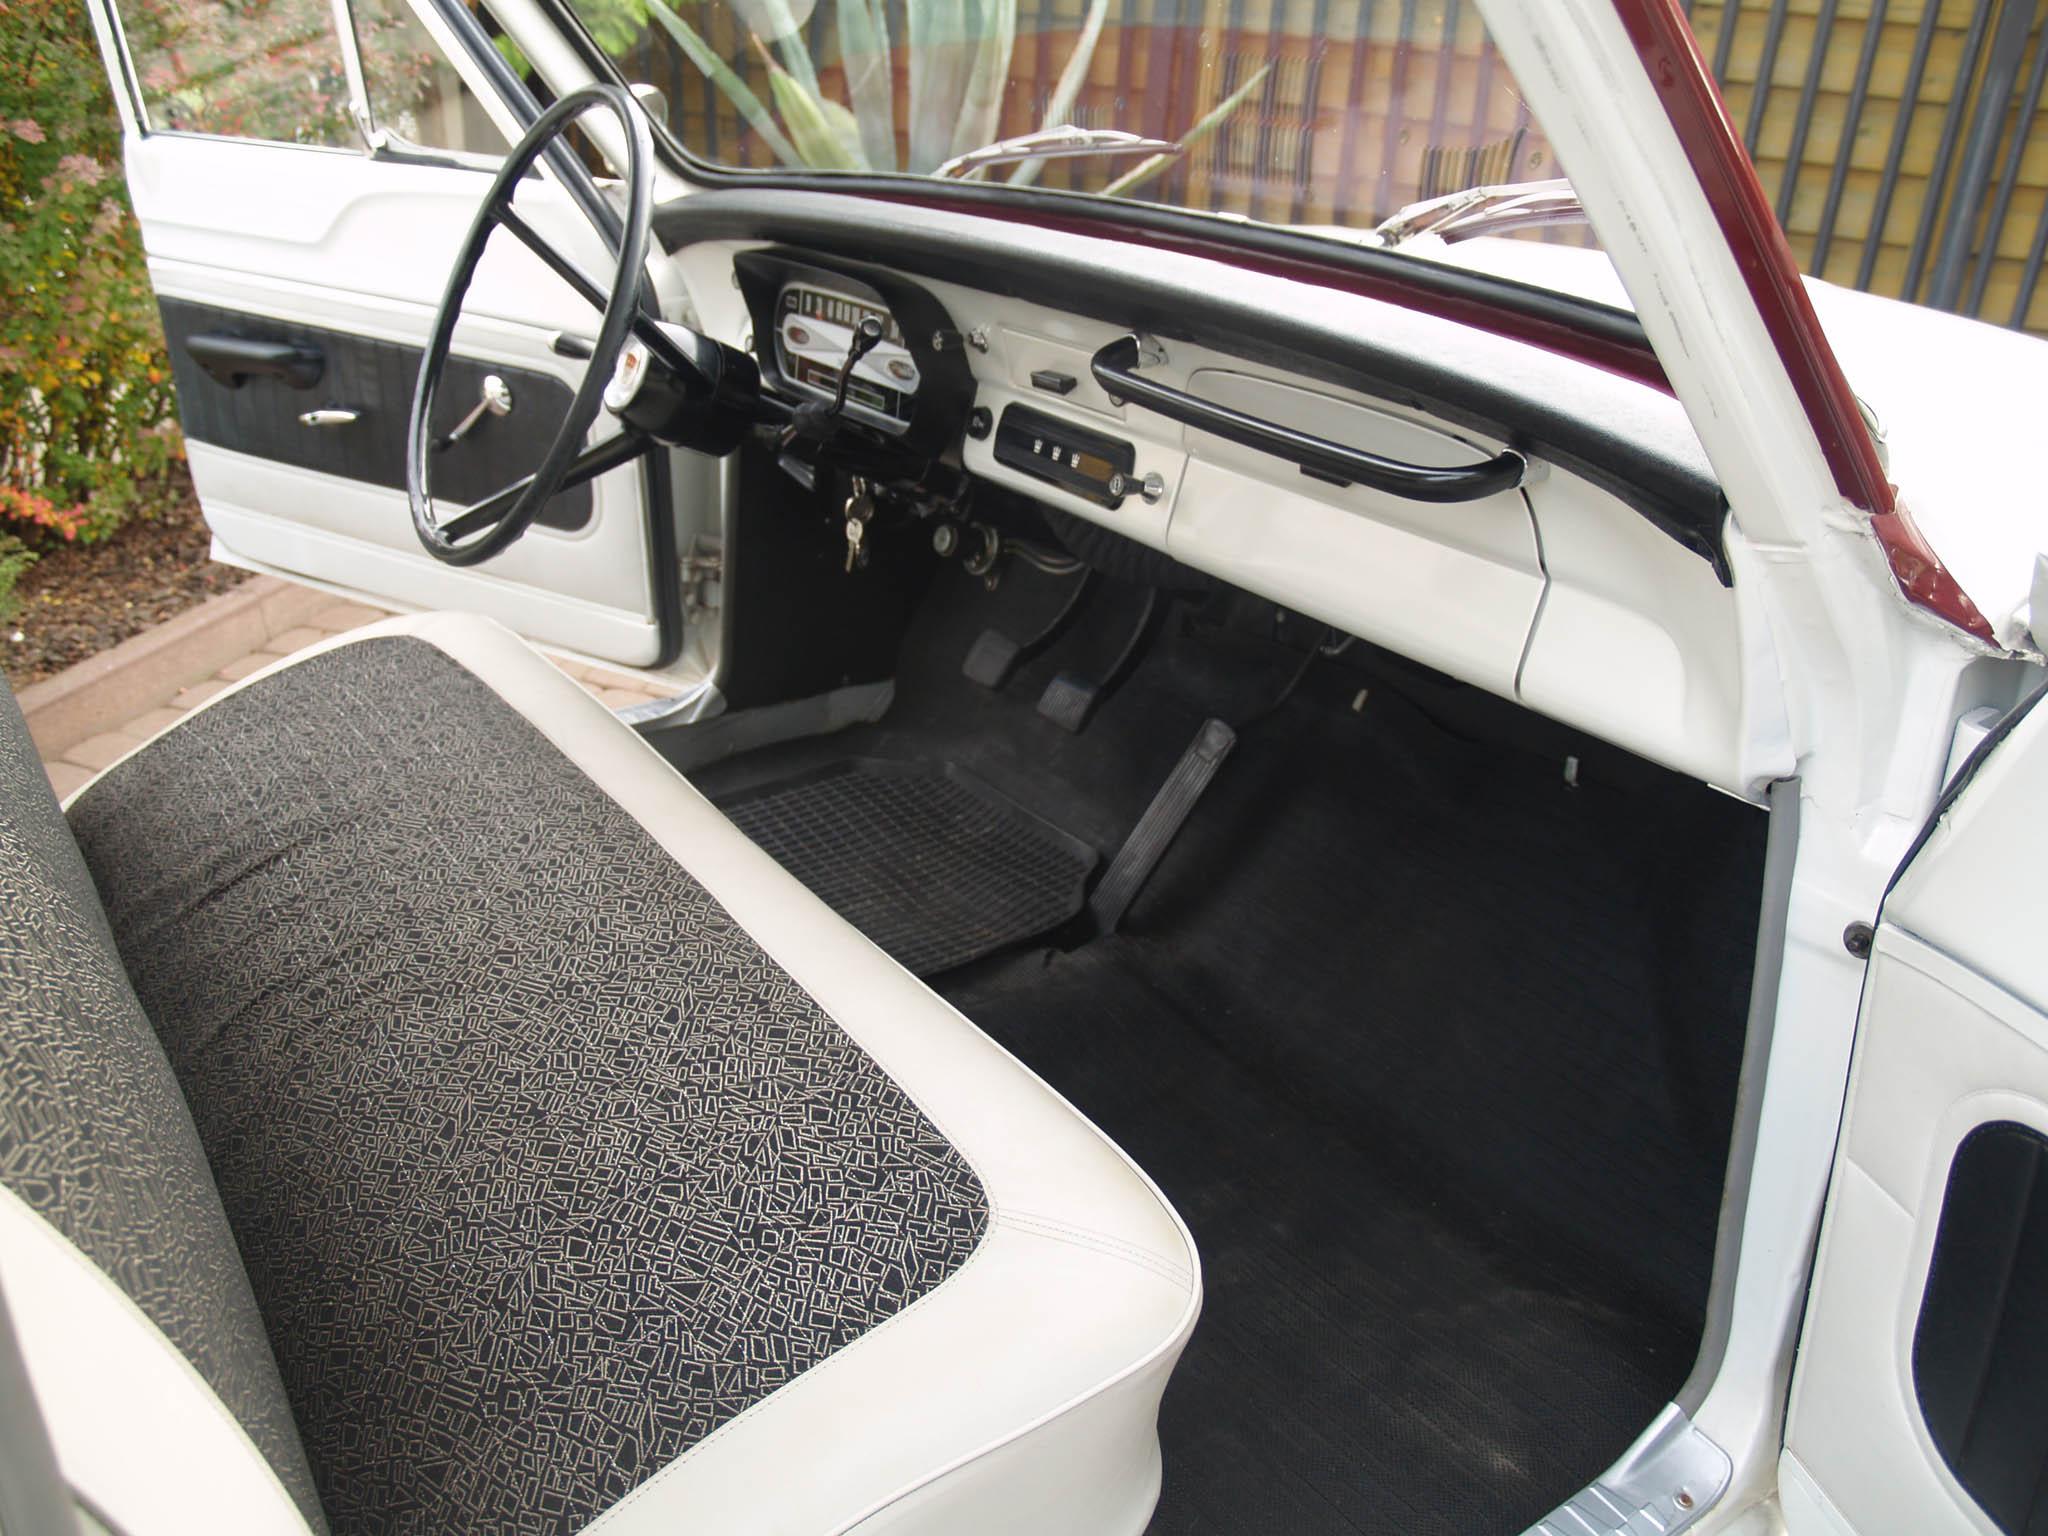 ford taunus 12 m p4 1964 70000 pln warszawa gie da. Black Bedroom Furniture Sets. Home Design Ideas